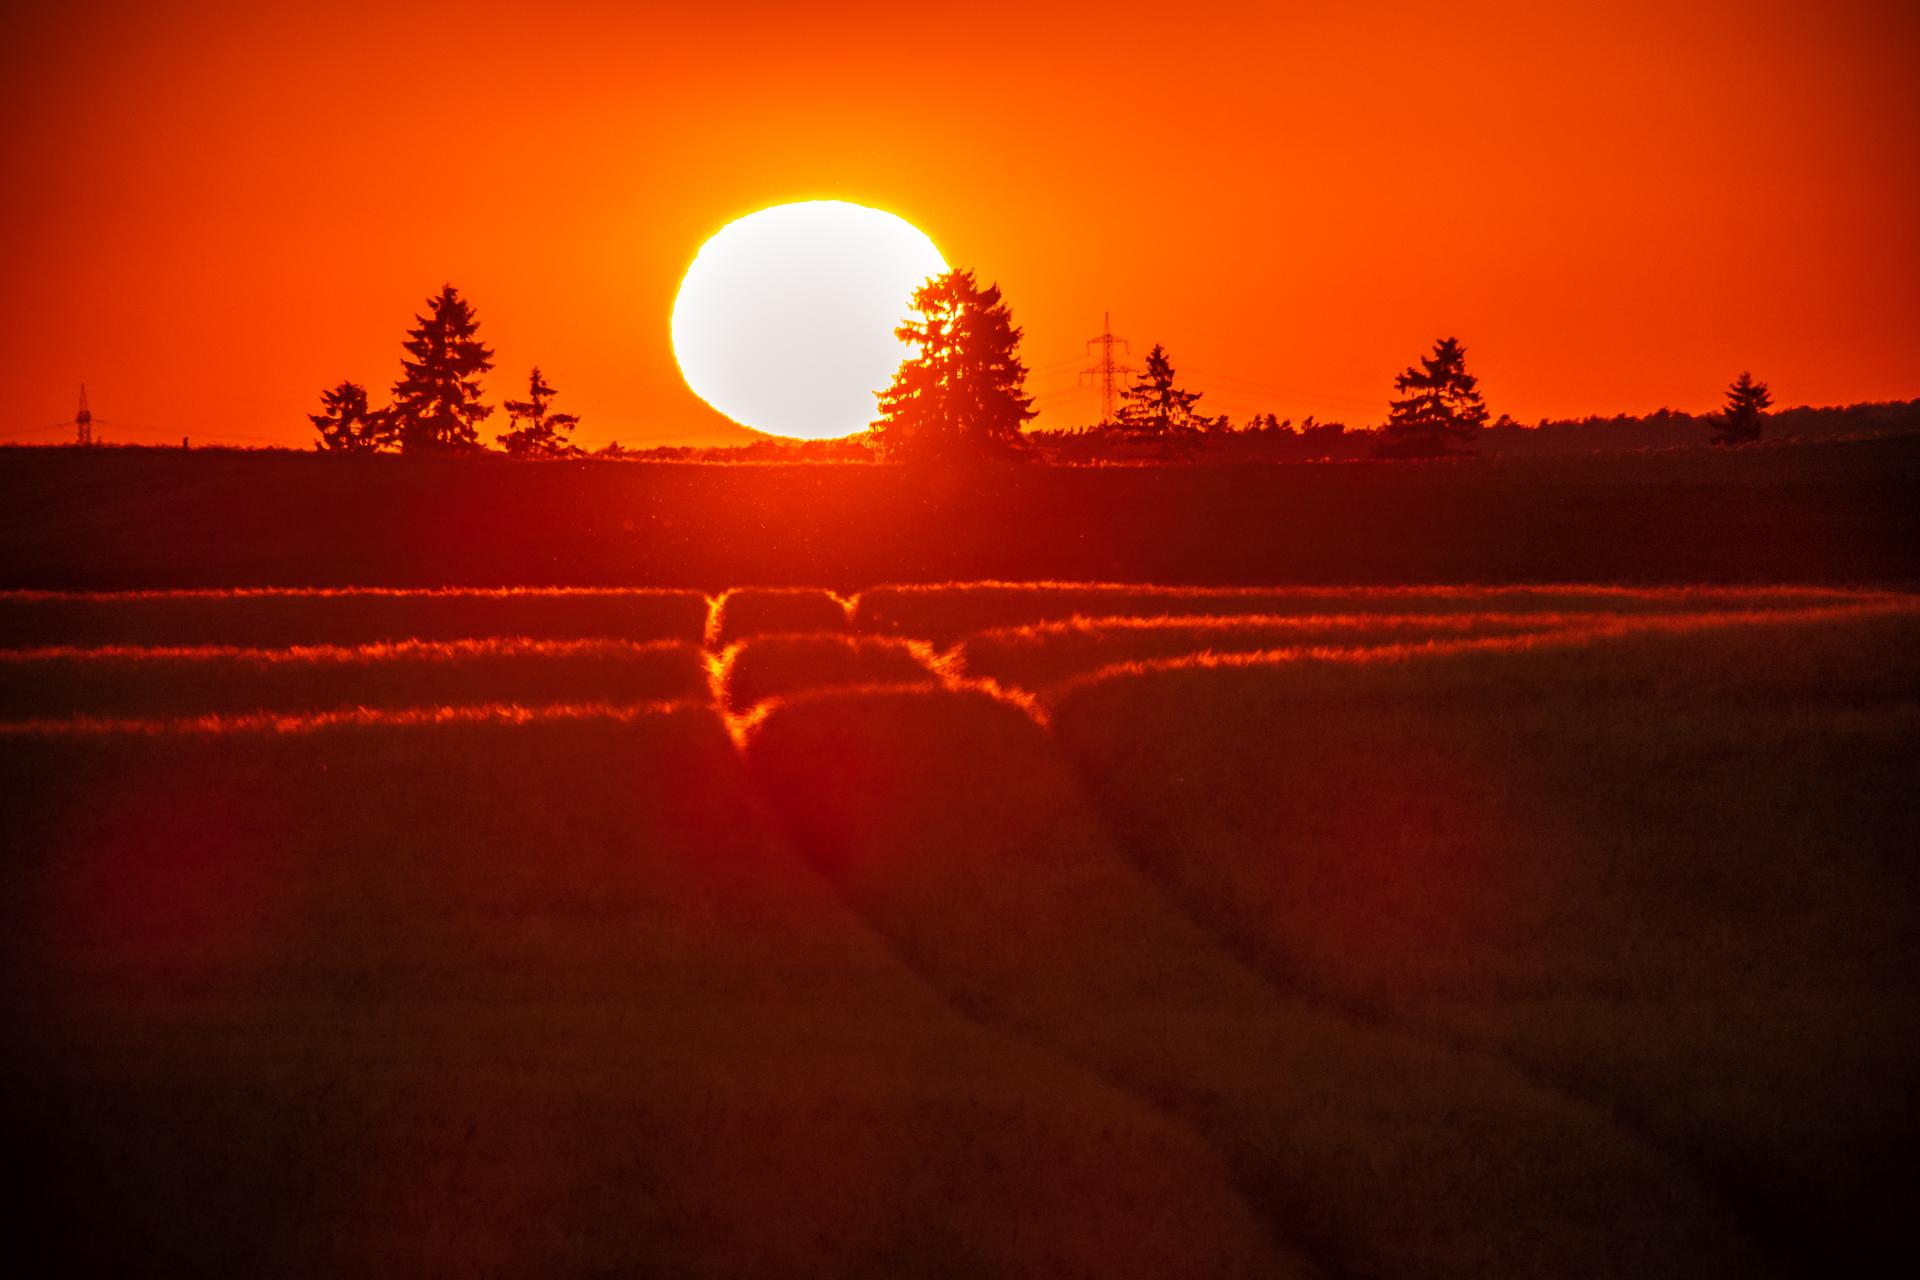 2018-07-07-Sonnenuntergang3.jpg